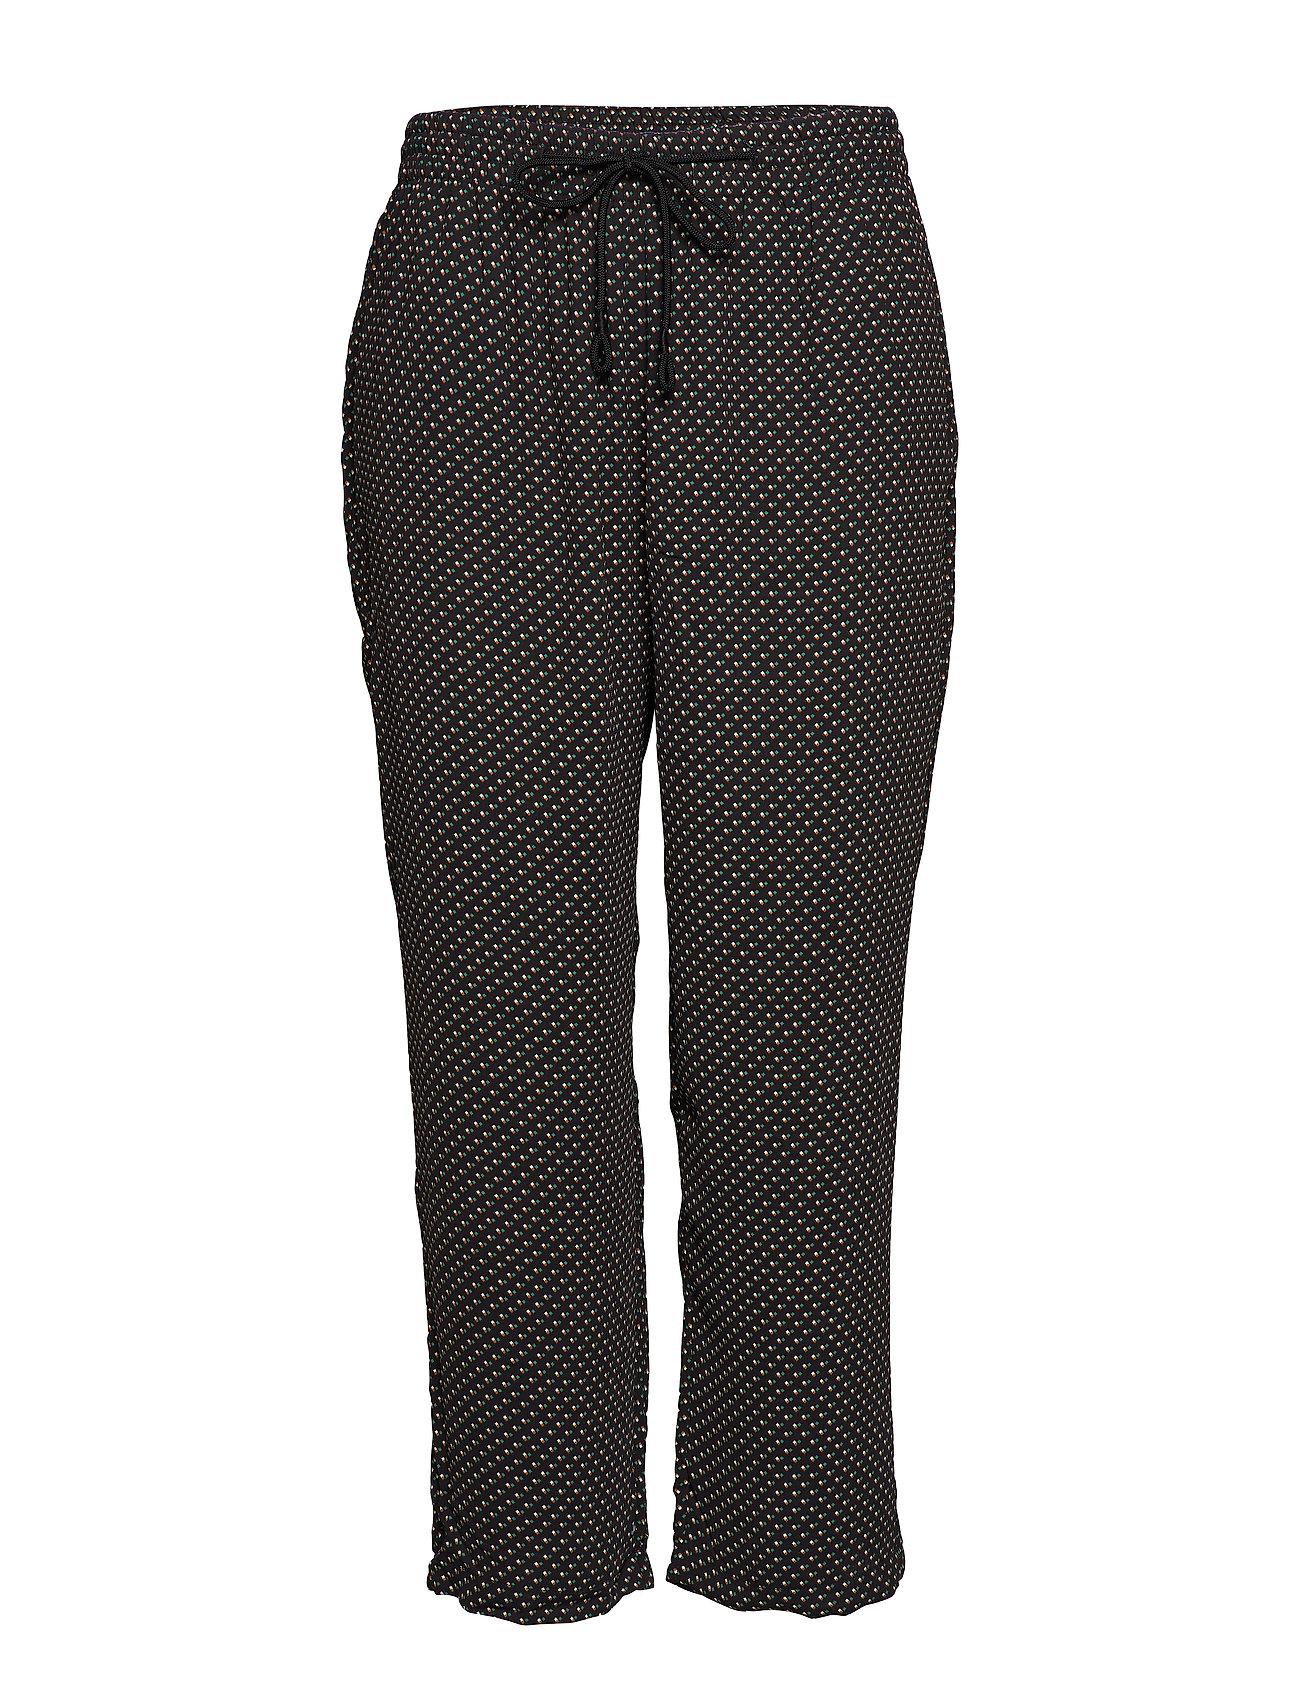 Printed Baggy Trousers Casual Bukser Sort VIOLETA BY MANGO